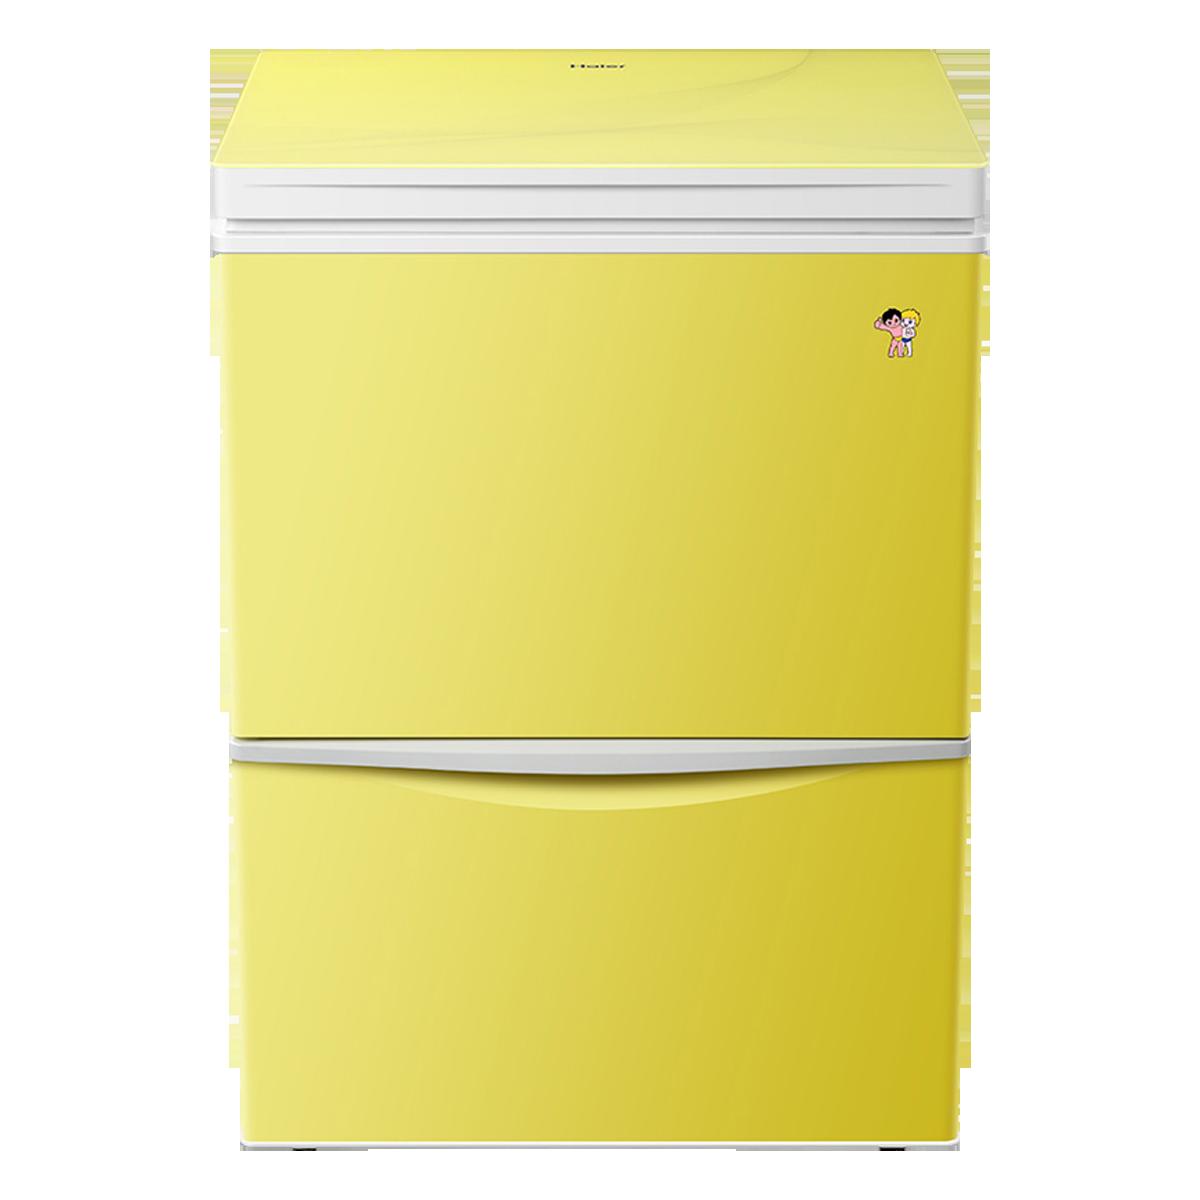 海尔Haier冷柜 LW-120HCD(黄色) 说明书